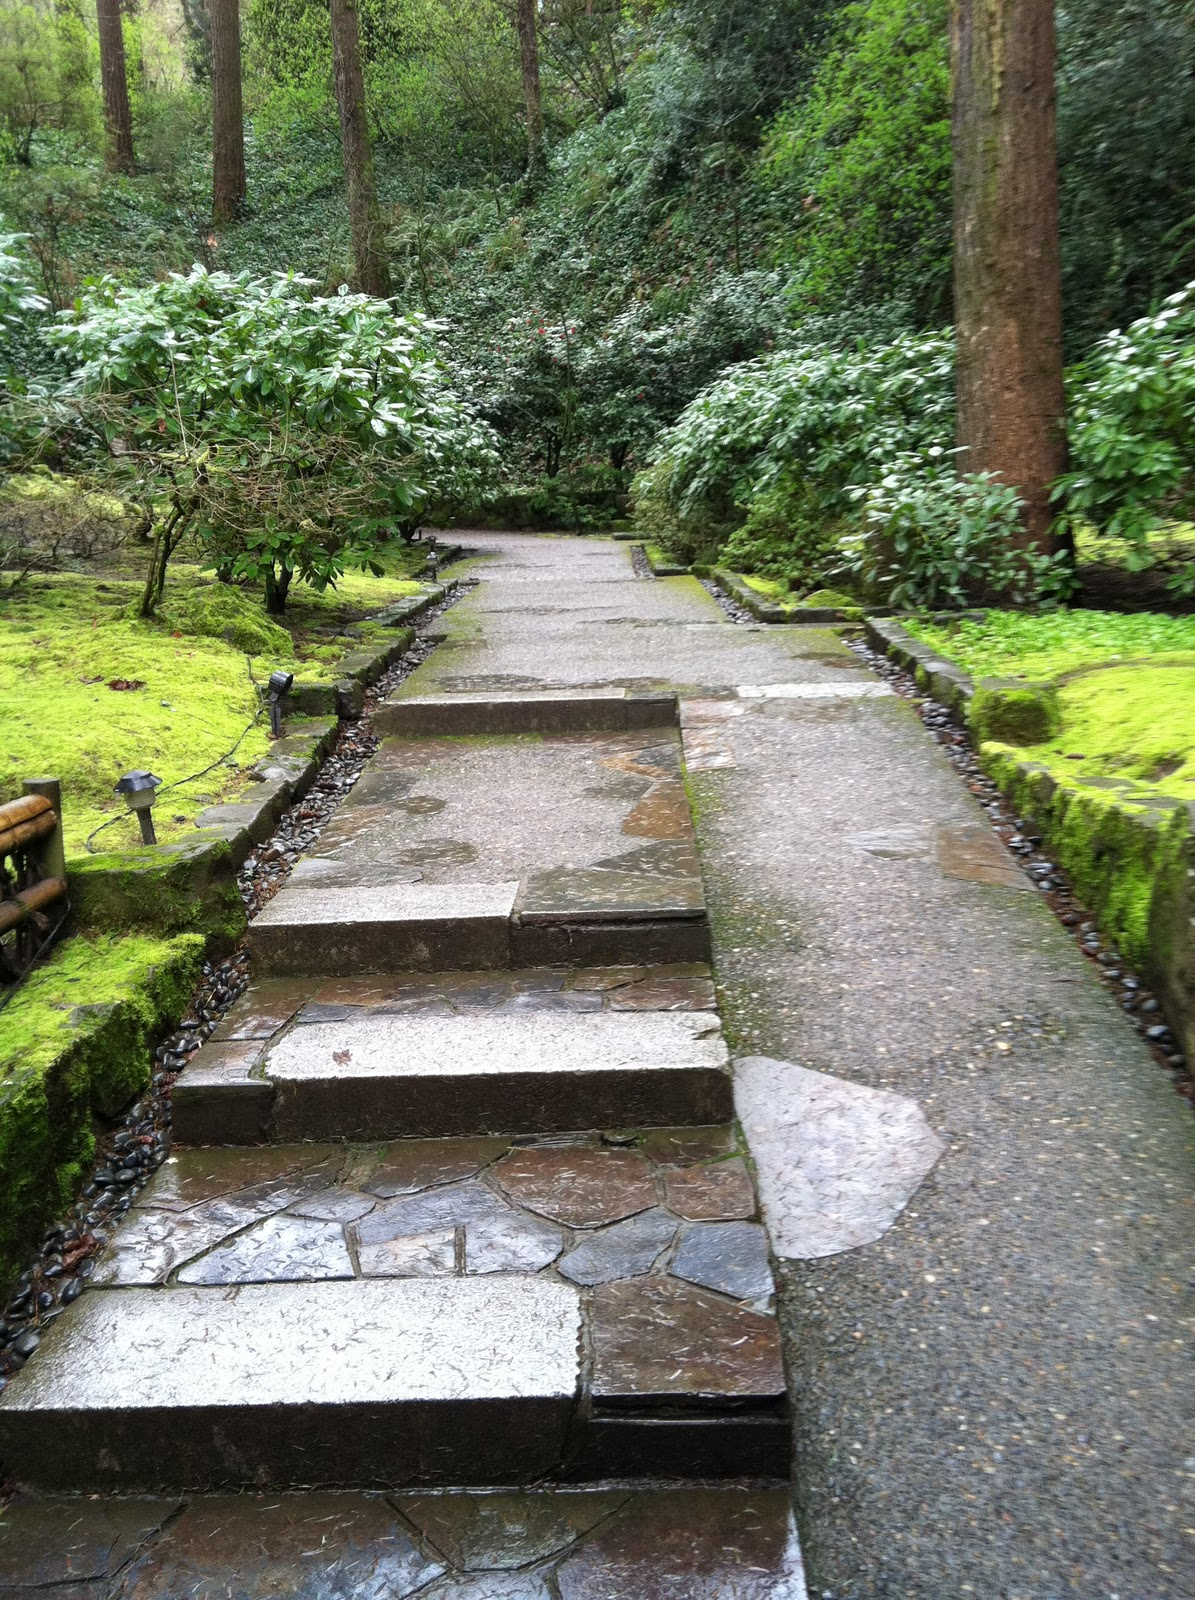 Stone U0026 Asphalt Inclining Pathway